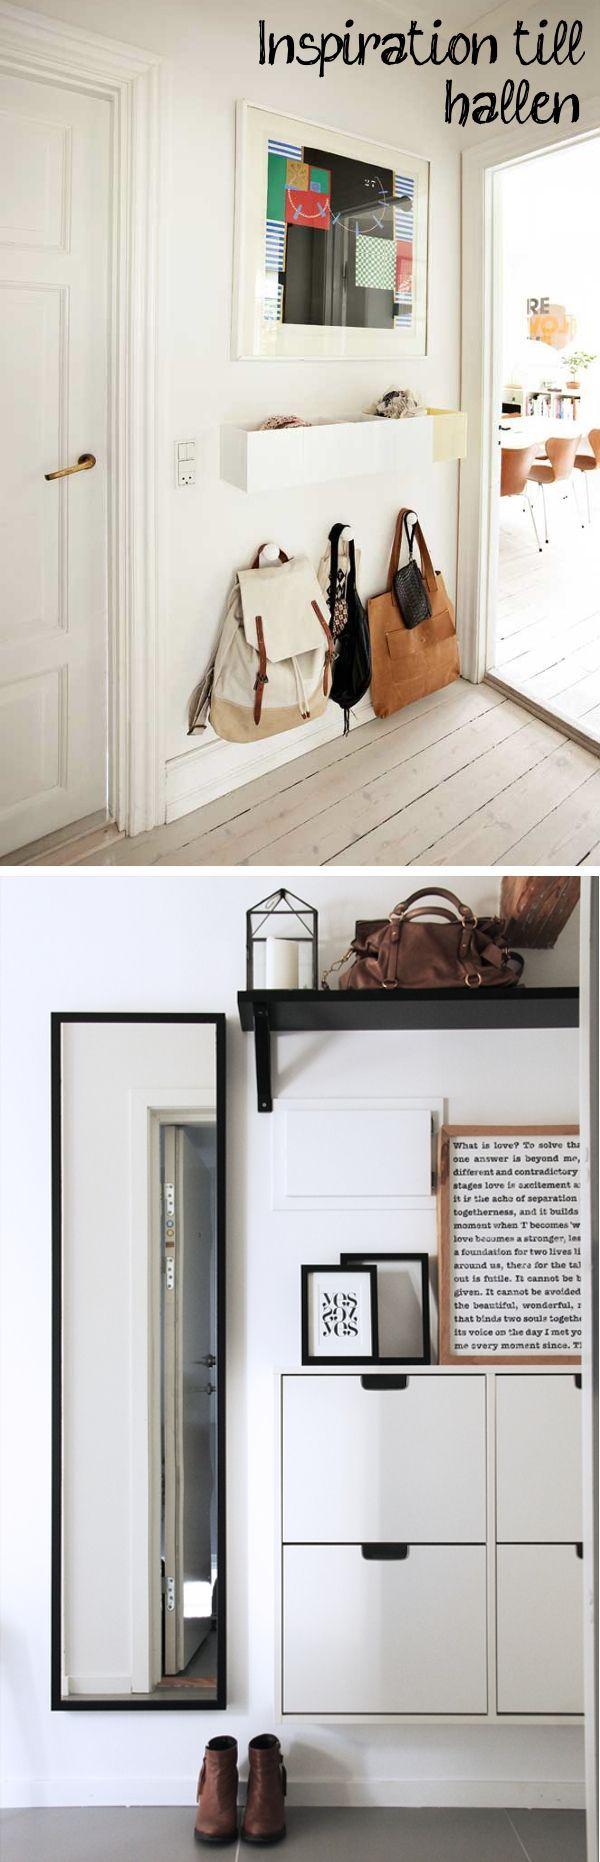 Hallway wall storage  Low level bag and small person coat storage in the hallway u  Pinteresu